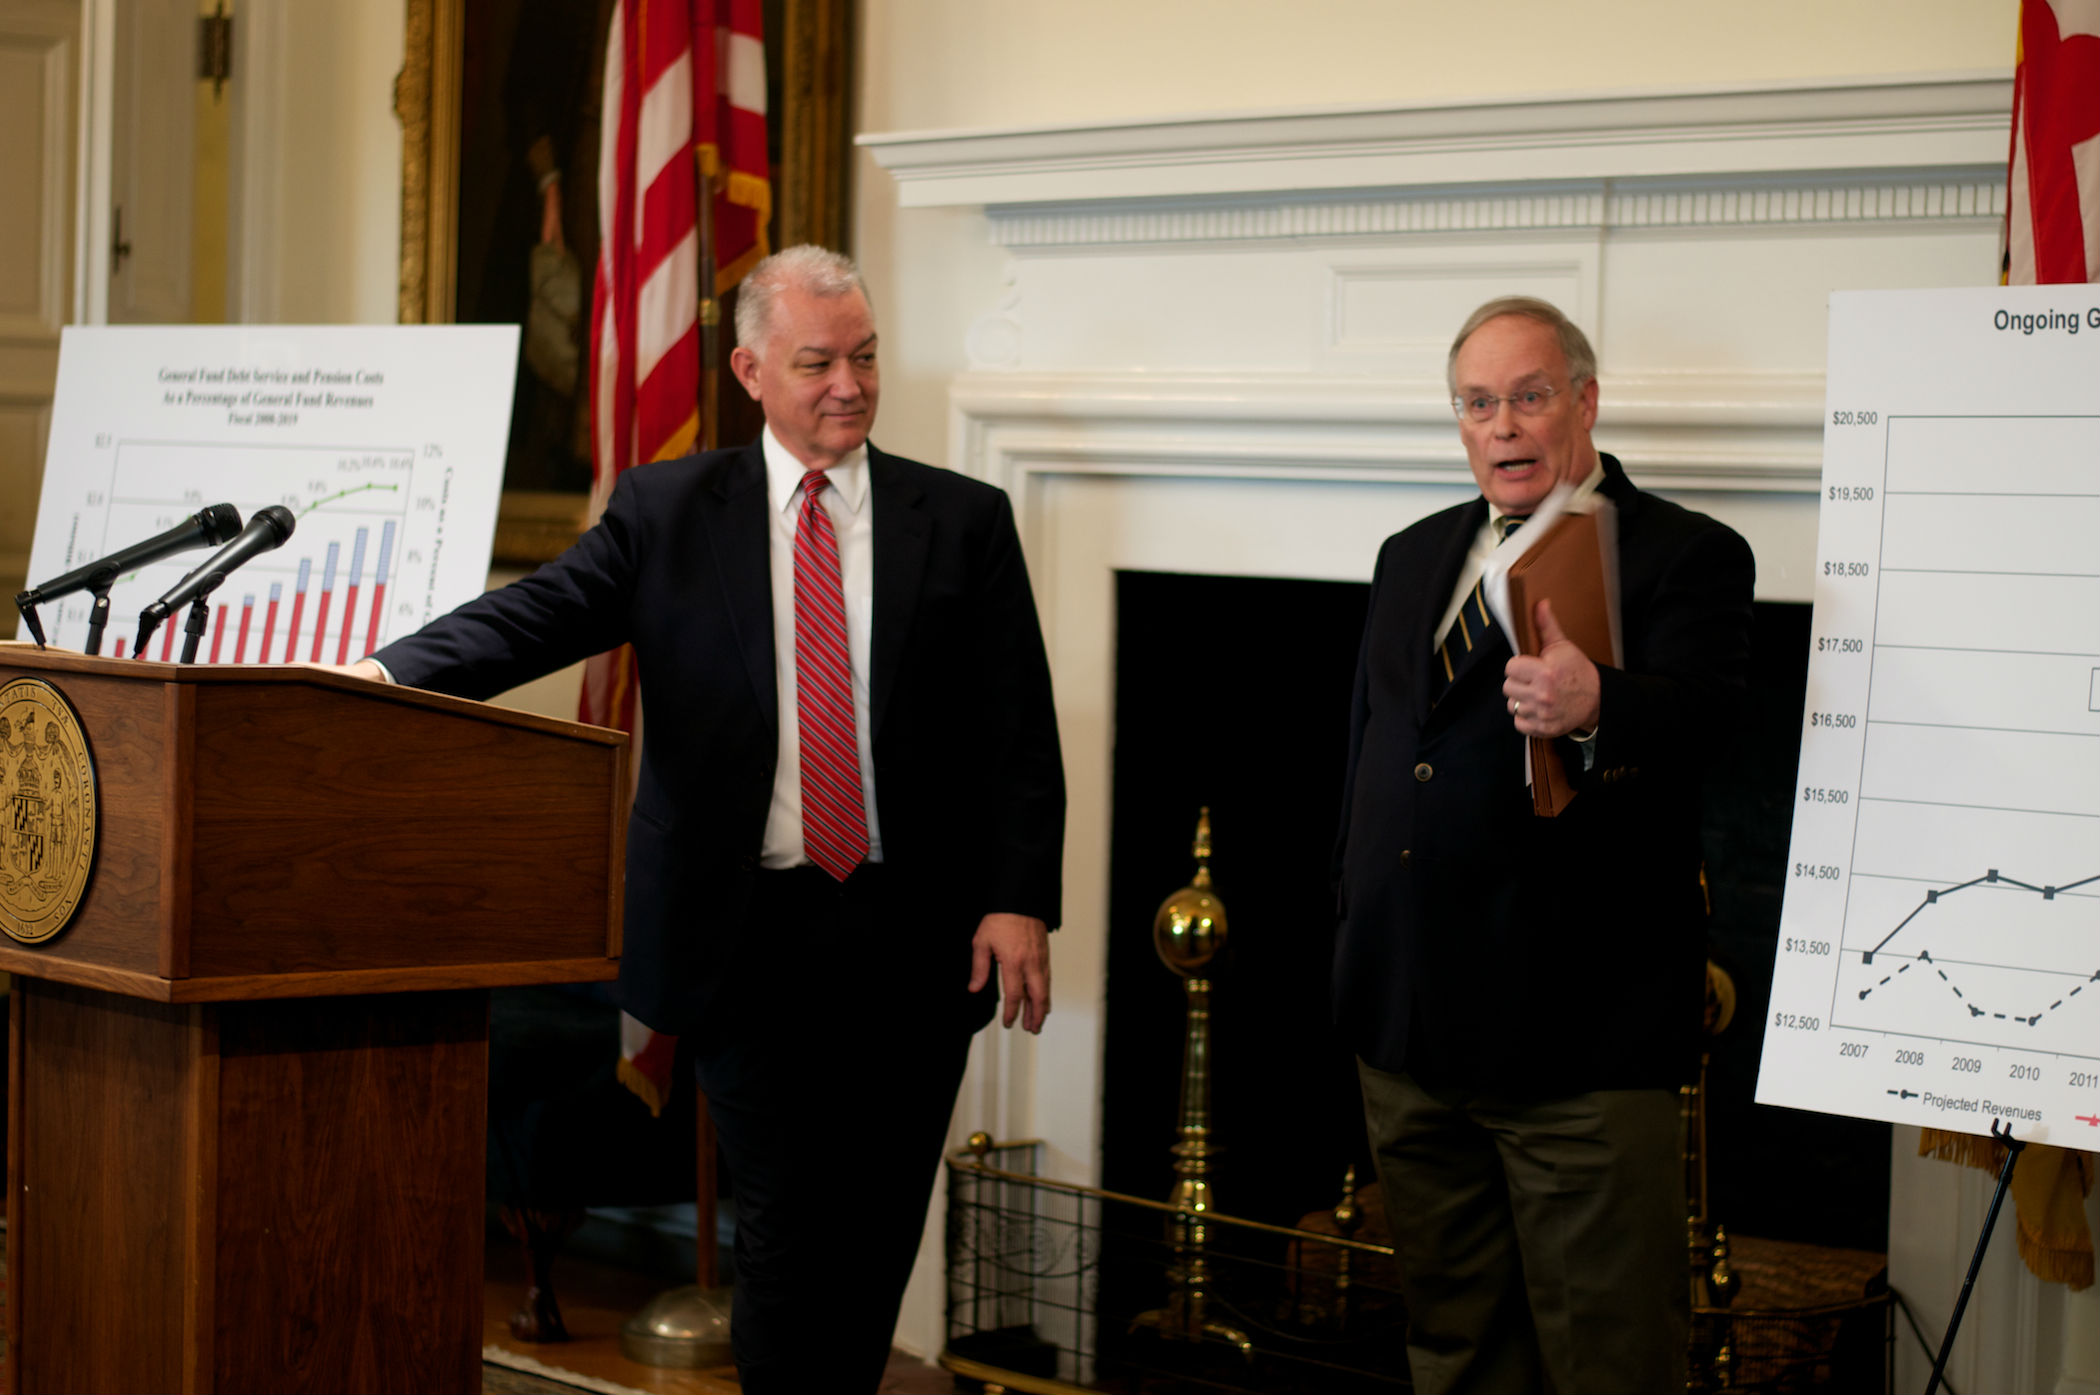 Rascovar: Hogan's placeholder budget